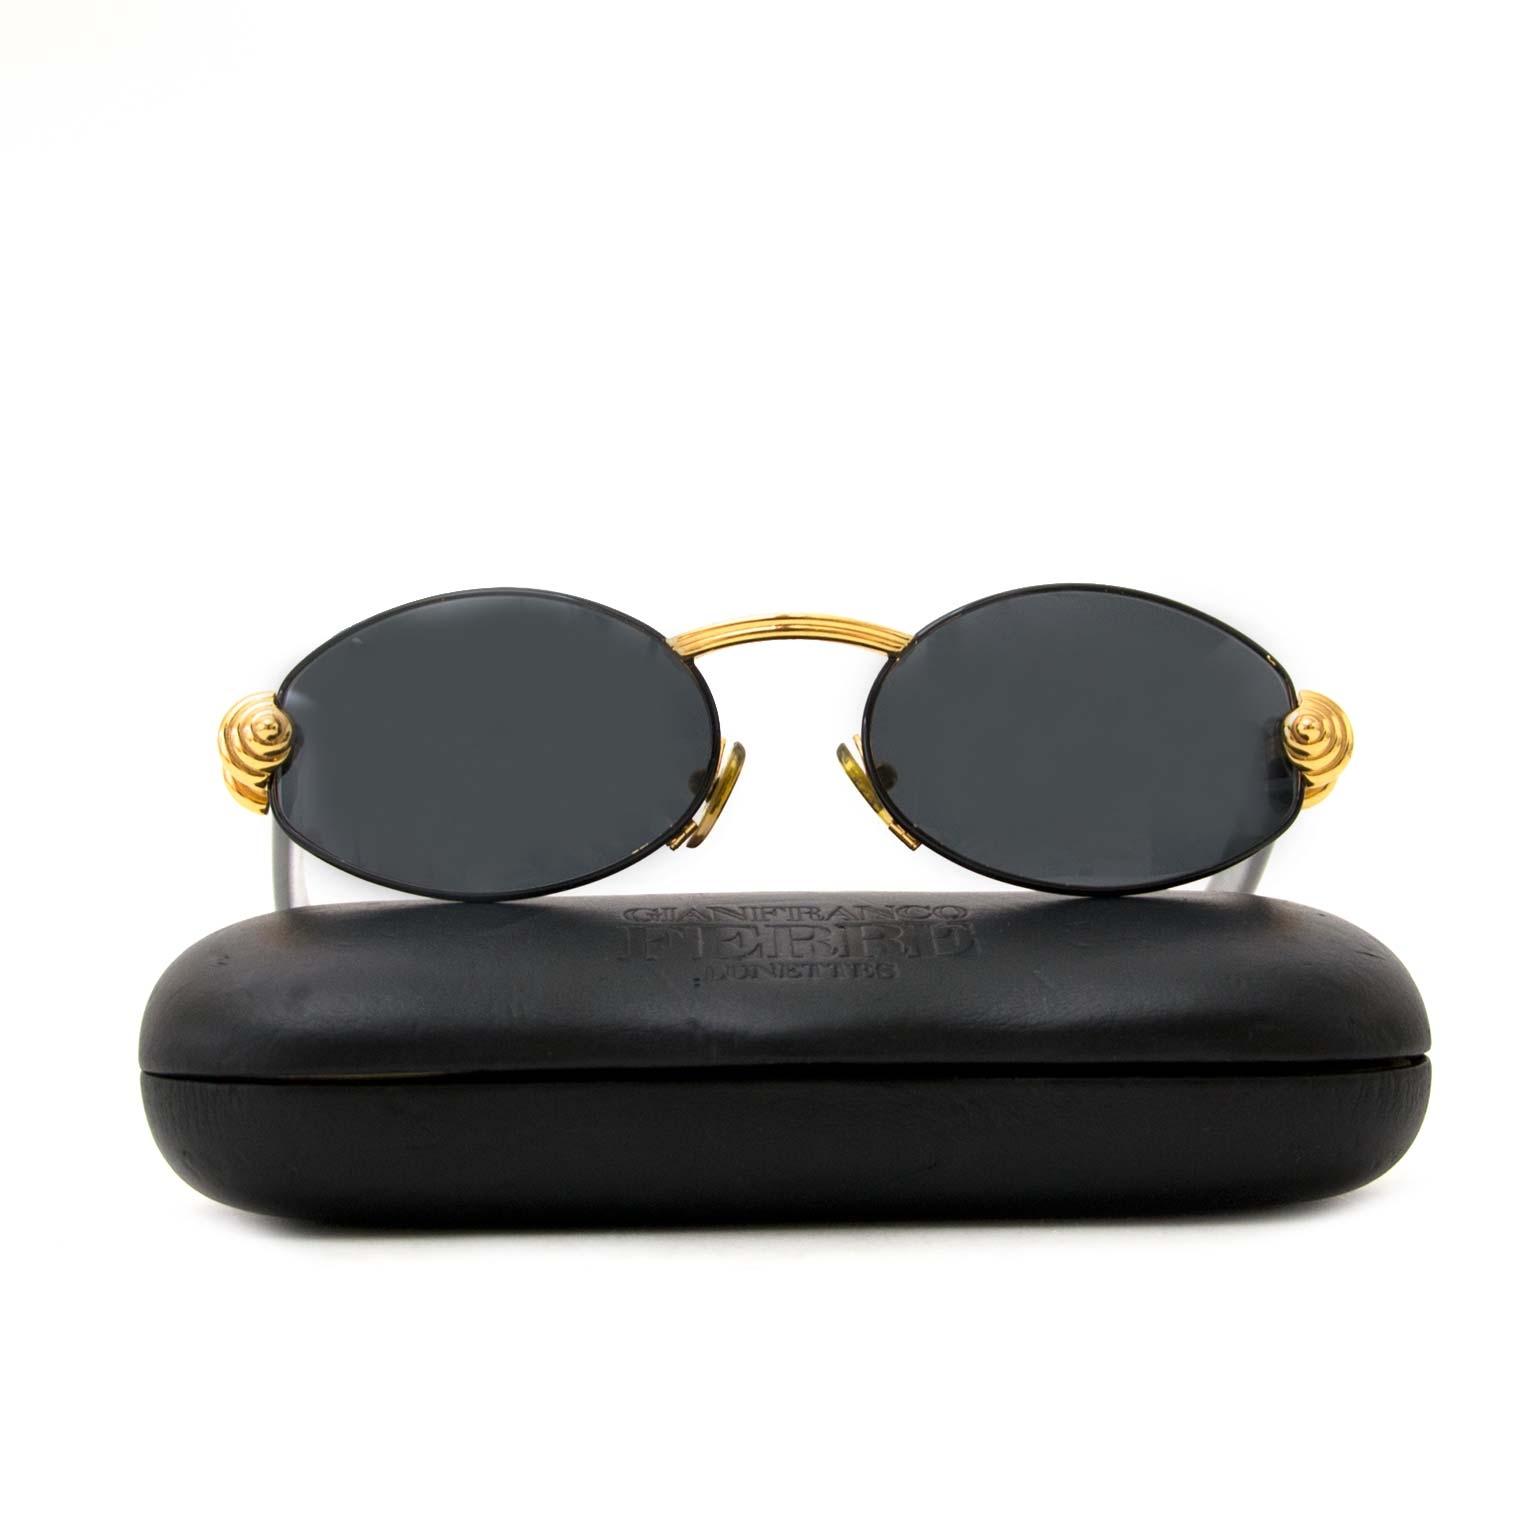 6ad61caaea5 ... koop authentieke gianfranco ferre ovale zonnebril bij labellov vintage  mode webshop belgië